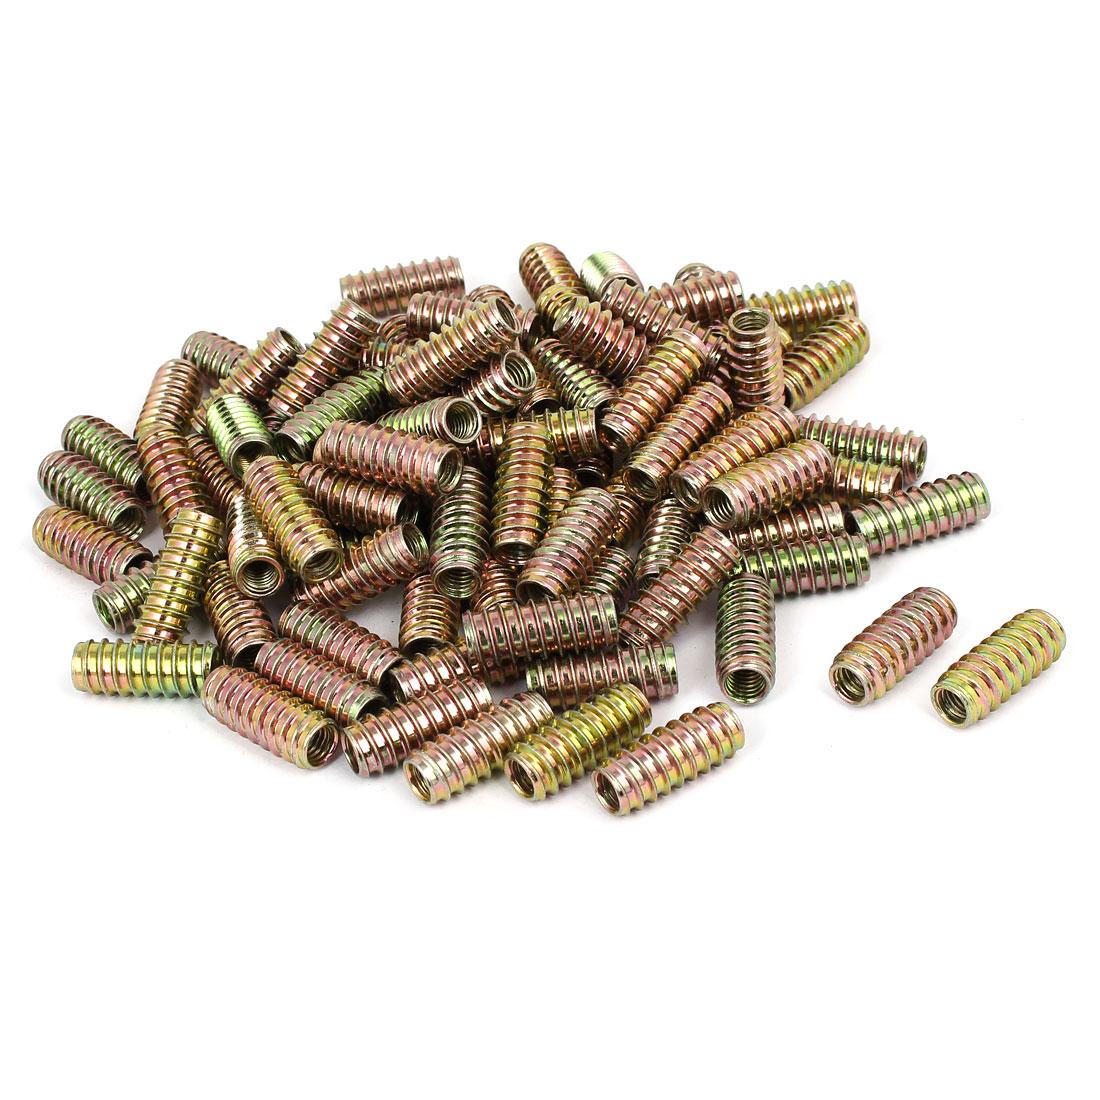 Wooden Furniture Fixing E-Nut Insert Nut Bronze Tone 8mmx30mm 100pcs